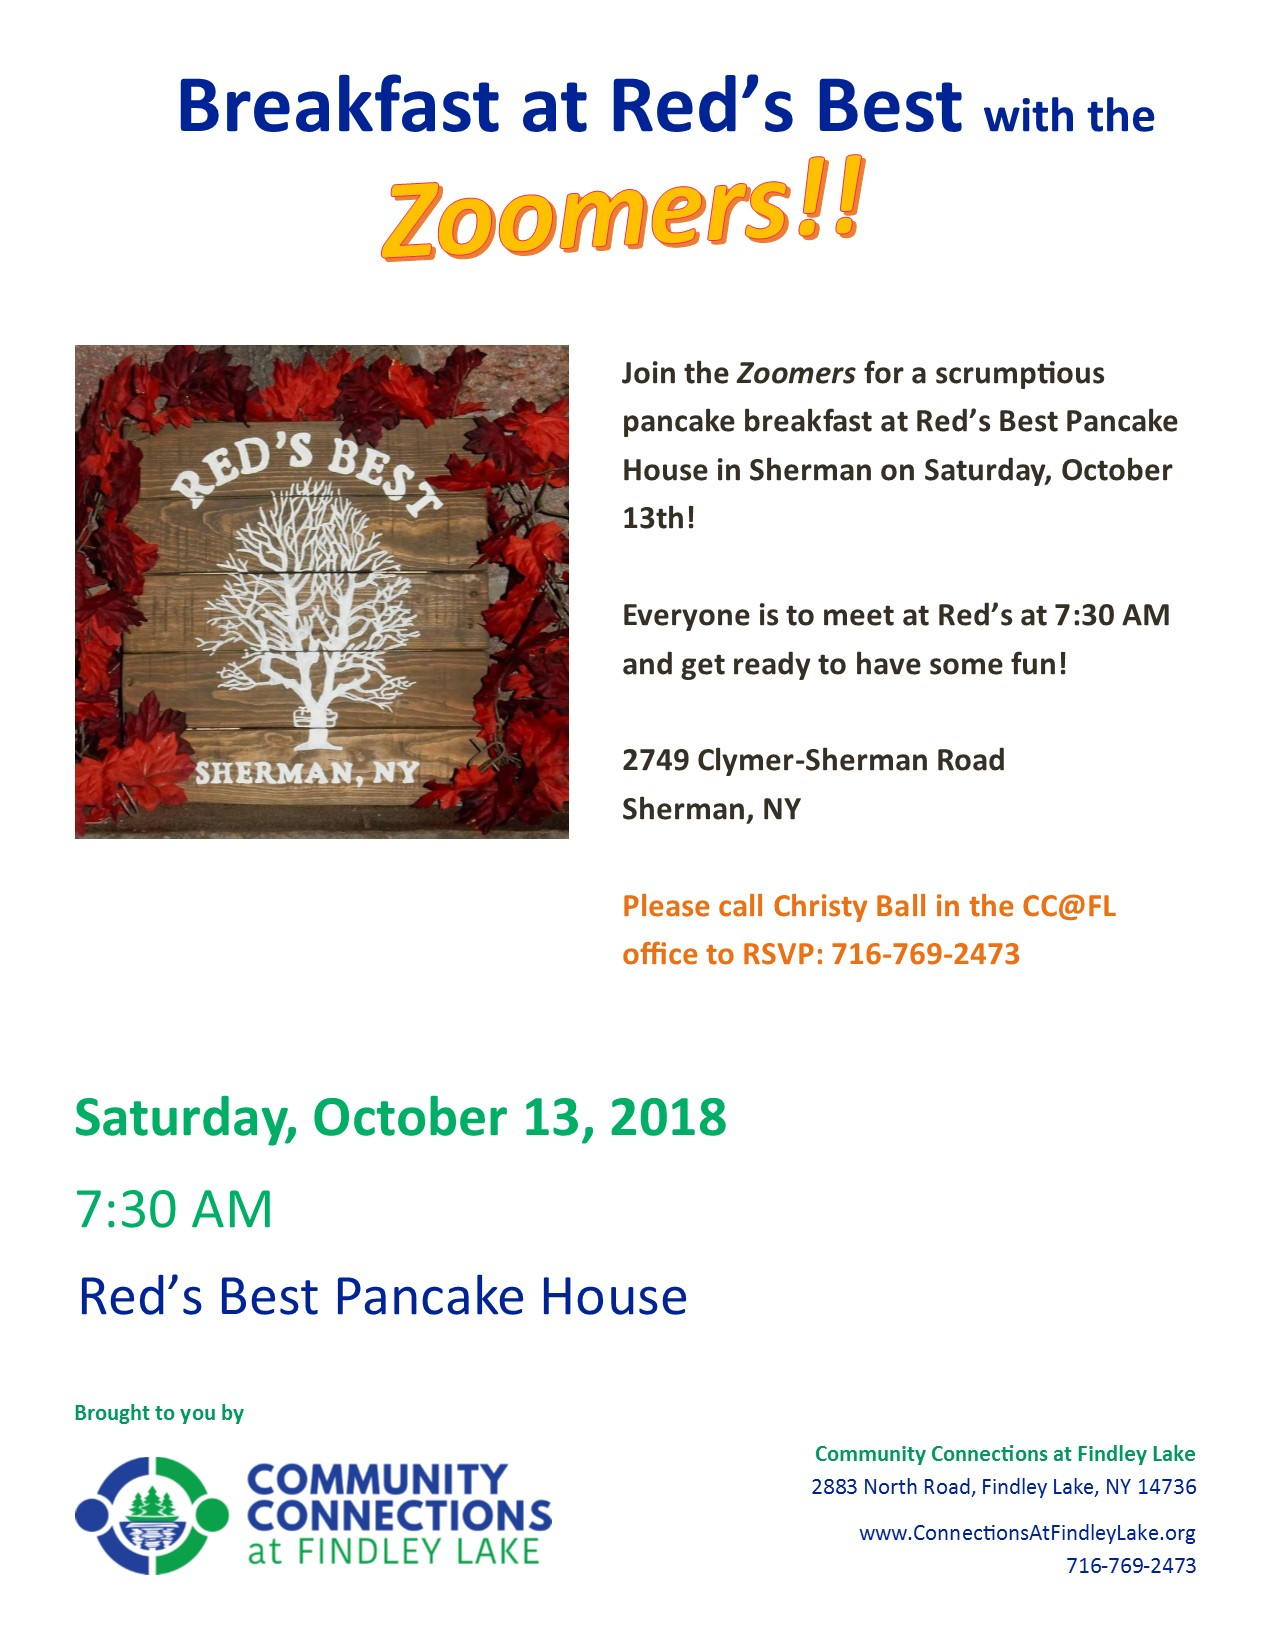 Zoomers Breakfast at Reds Best.jpg